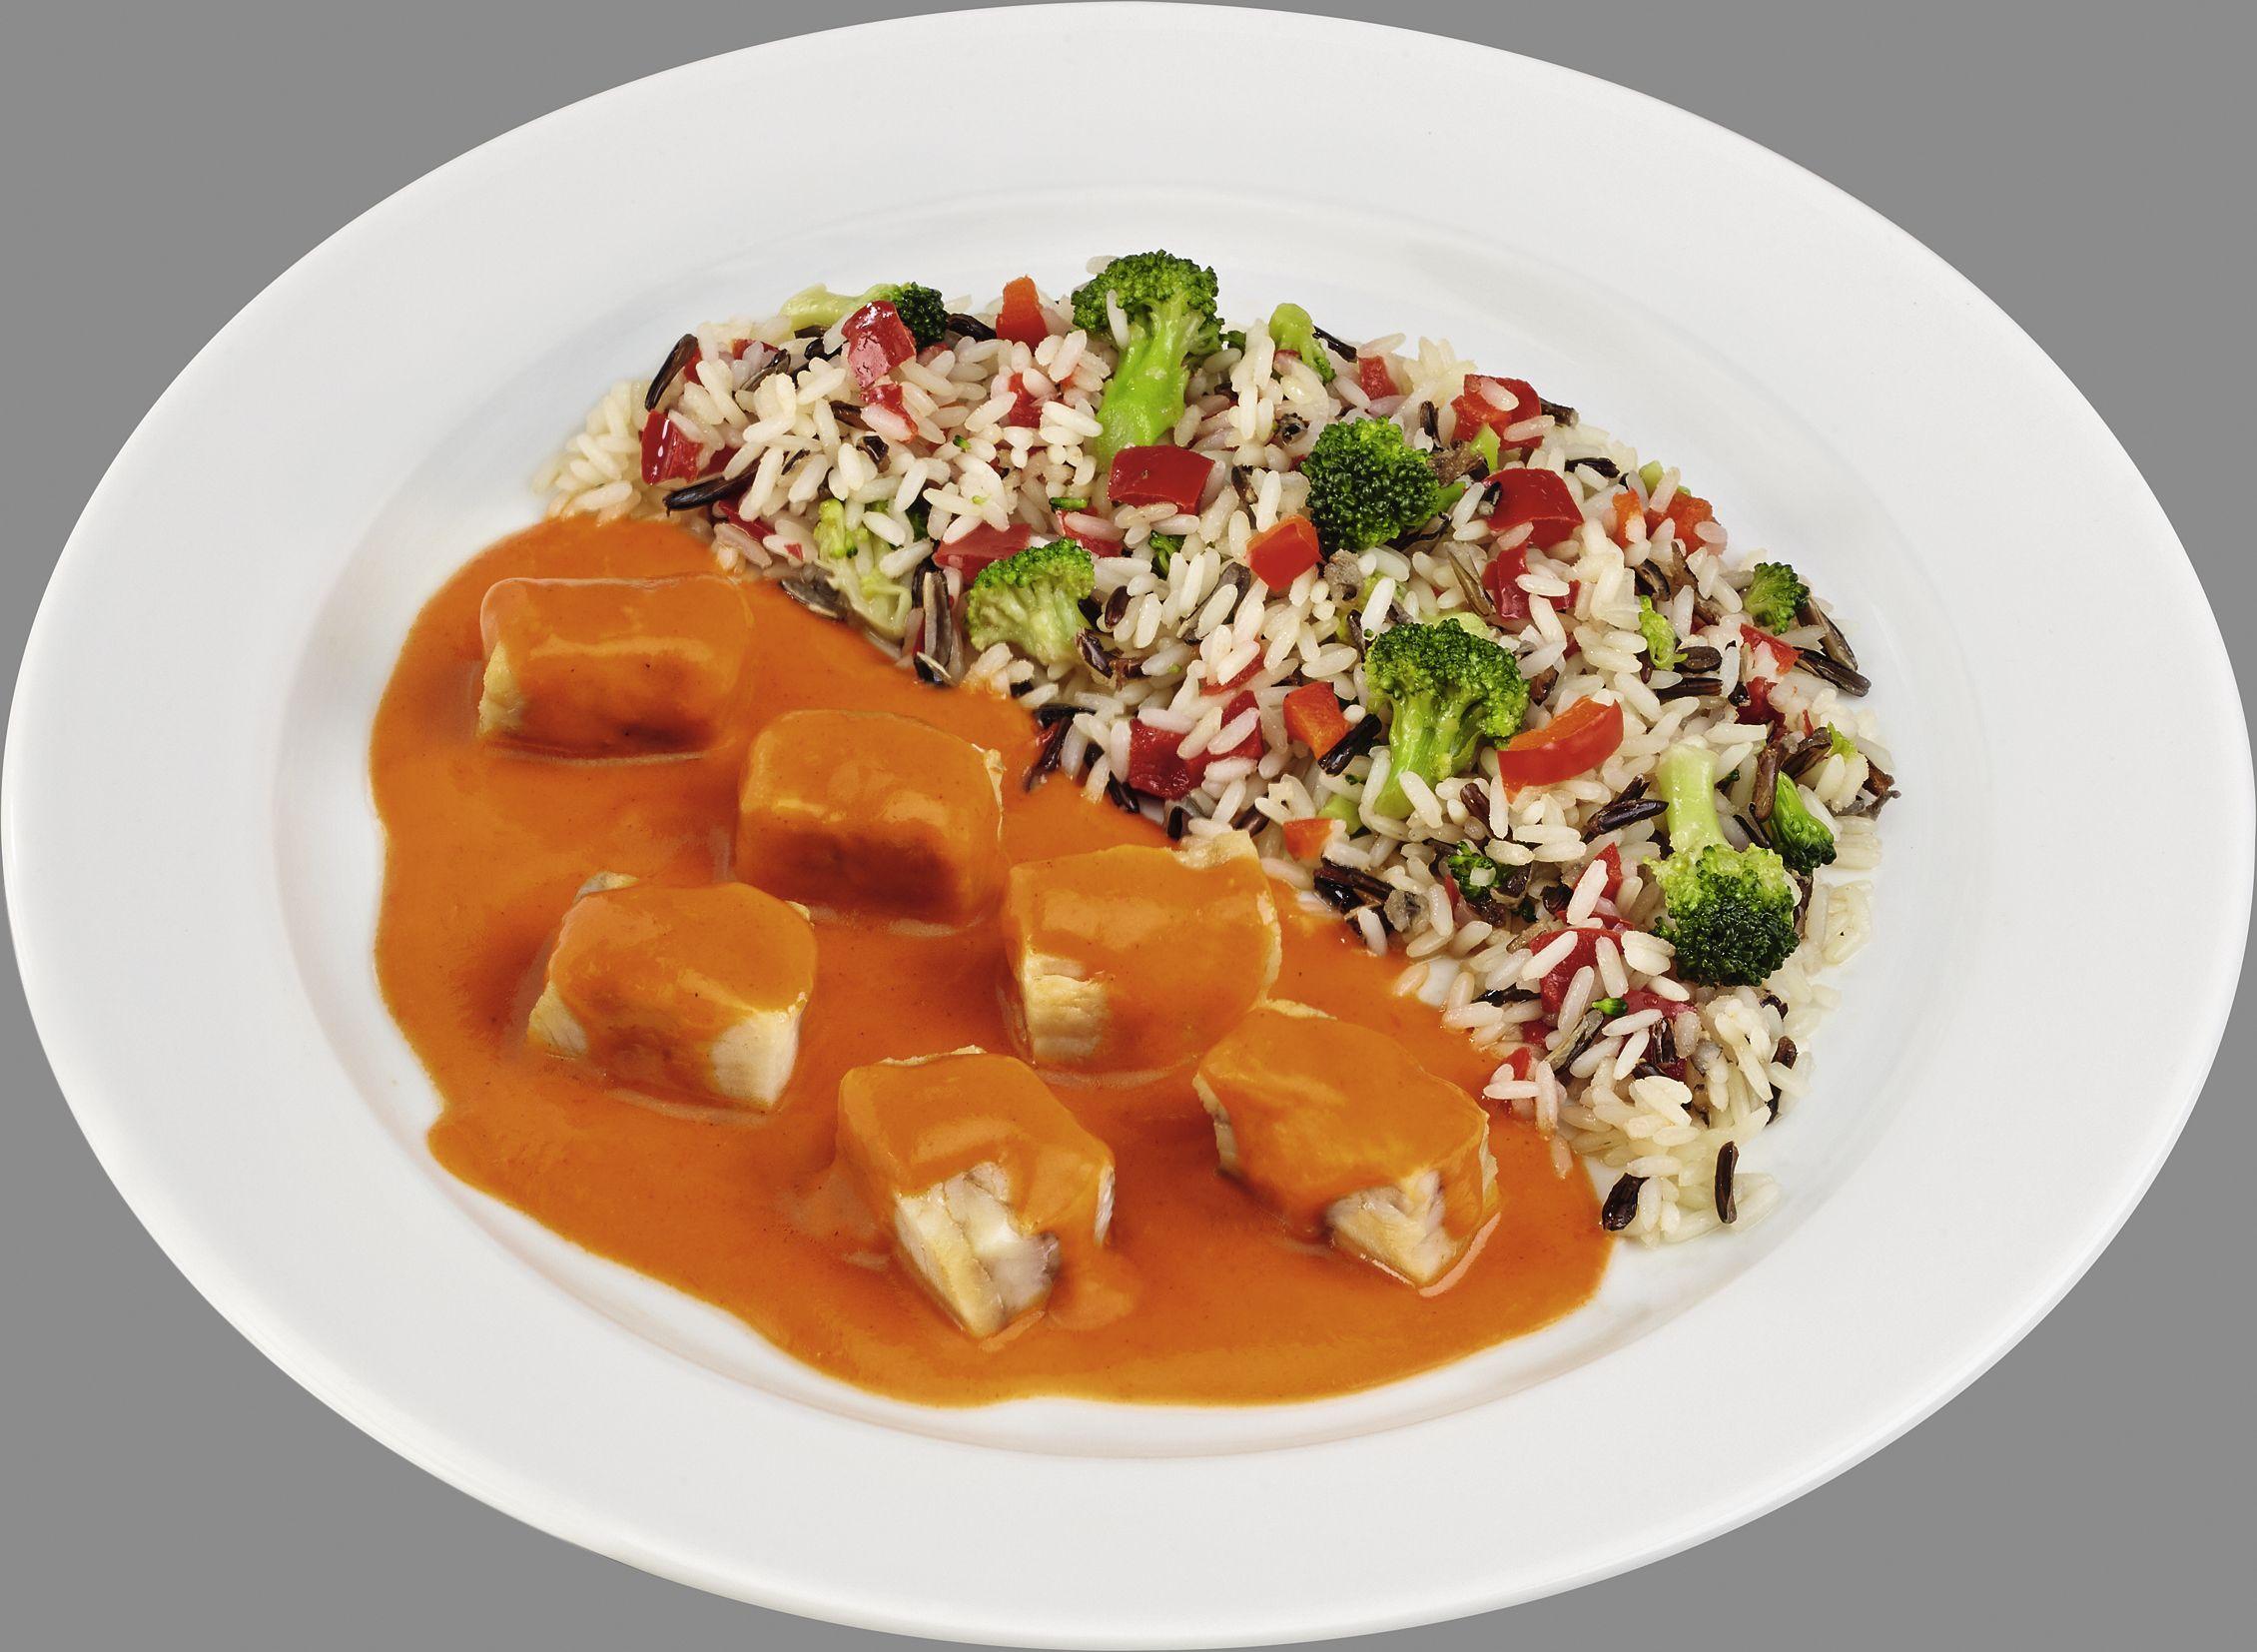 Alaska-Seelachs in roter Paprika-Rahmsoße mit Reis-Wildreis-Kombination mit Gemüse